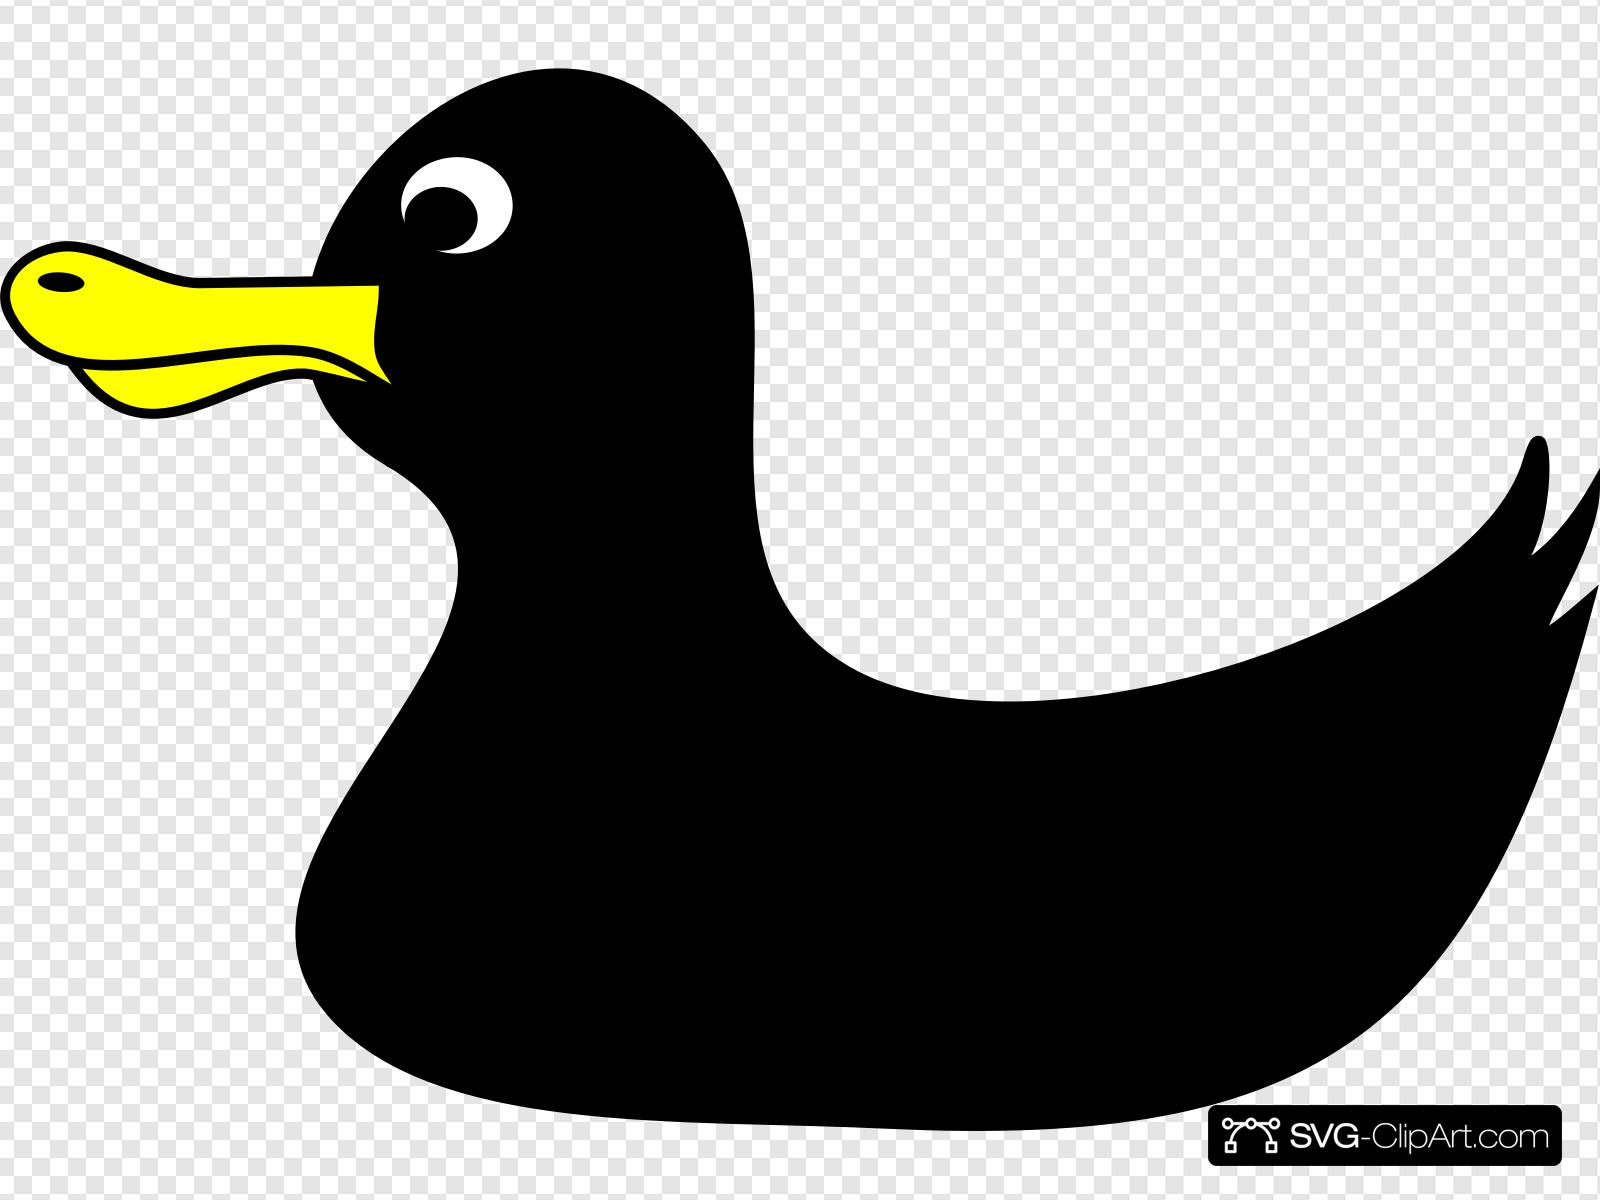 Black duck clipart clip black and white Black Duck Clip art, Icon and SVG - SVG Clipart clip black and white